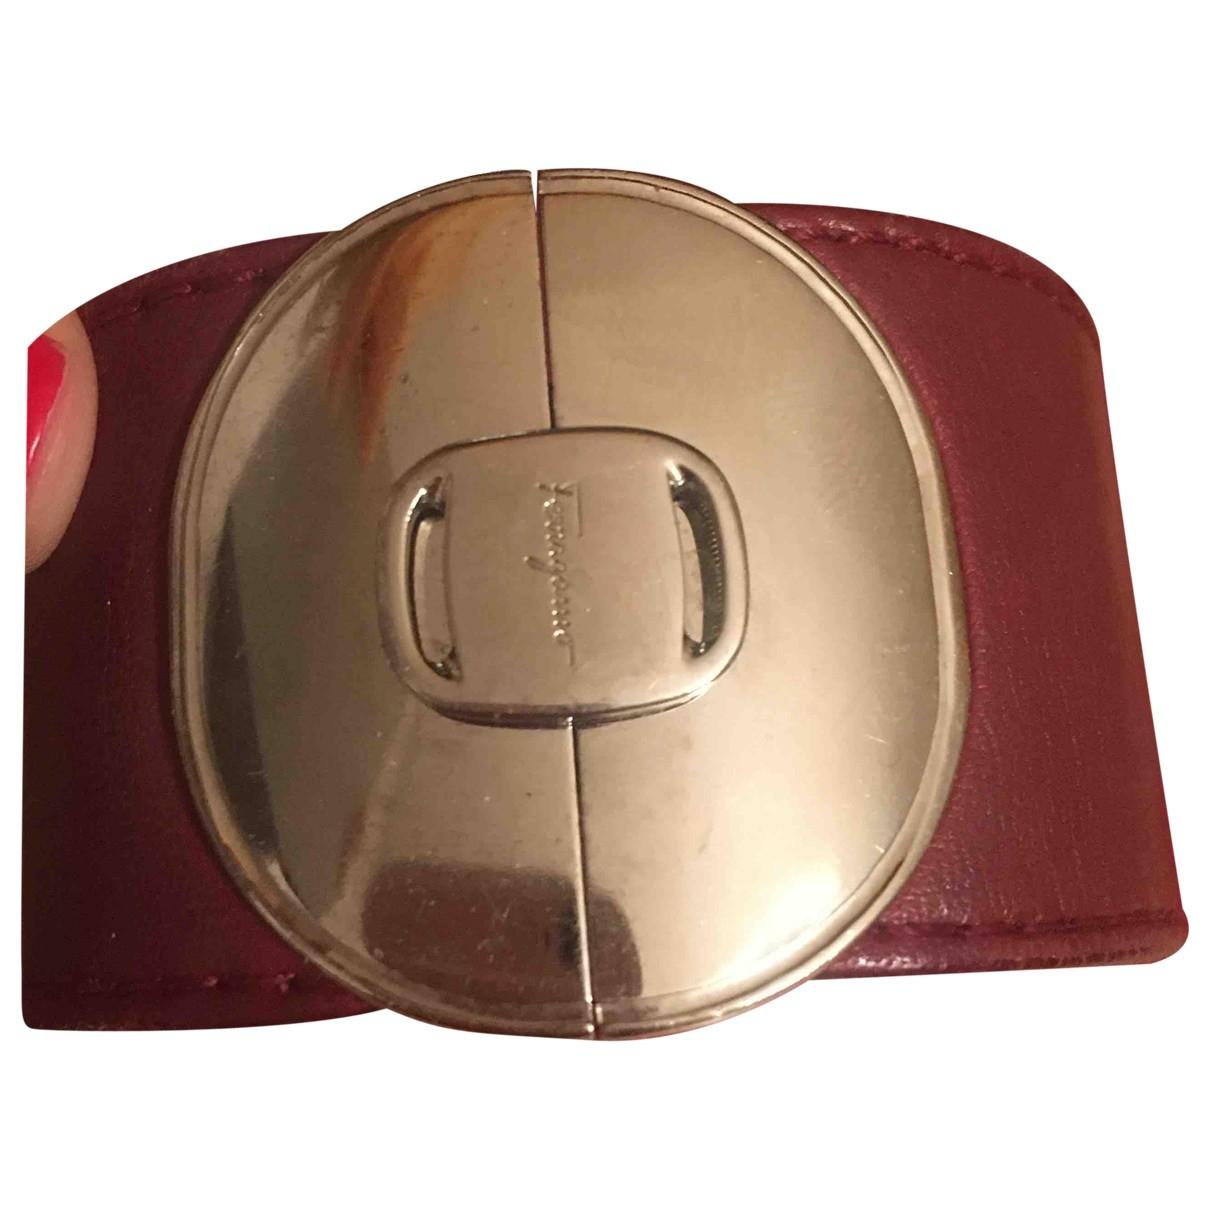 Salvatore Ferragamo \N Burgundy Leather bracelet for Women \N